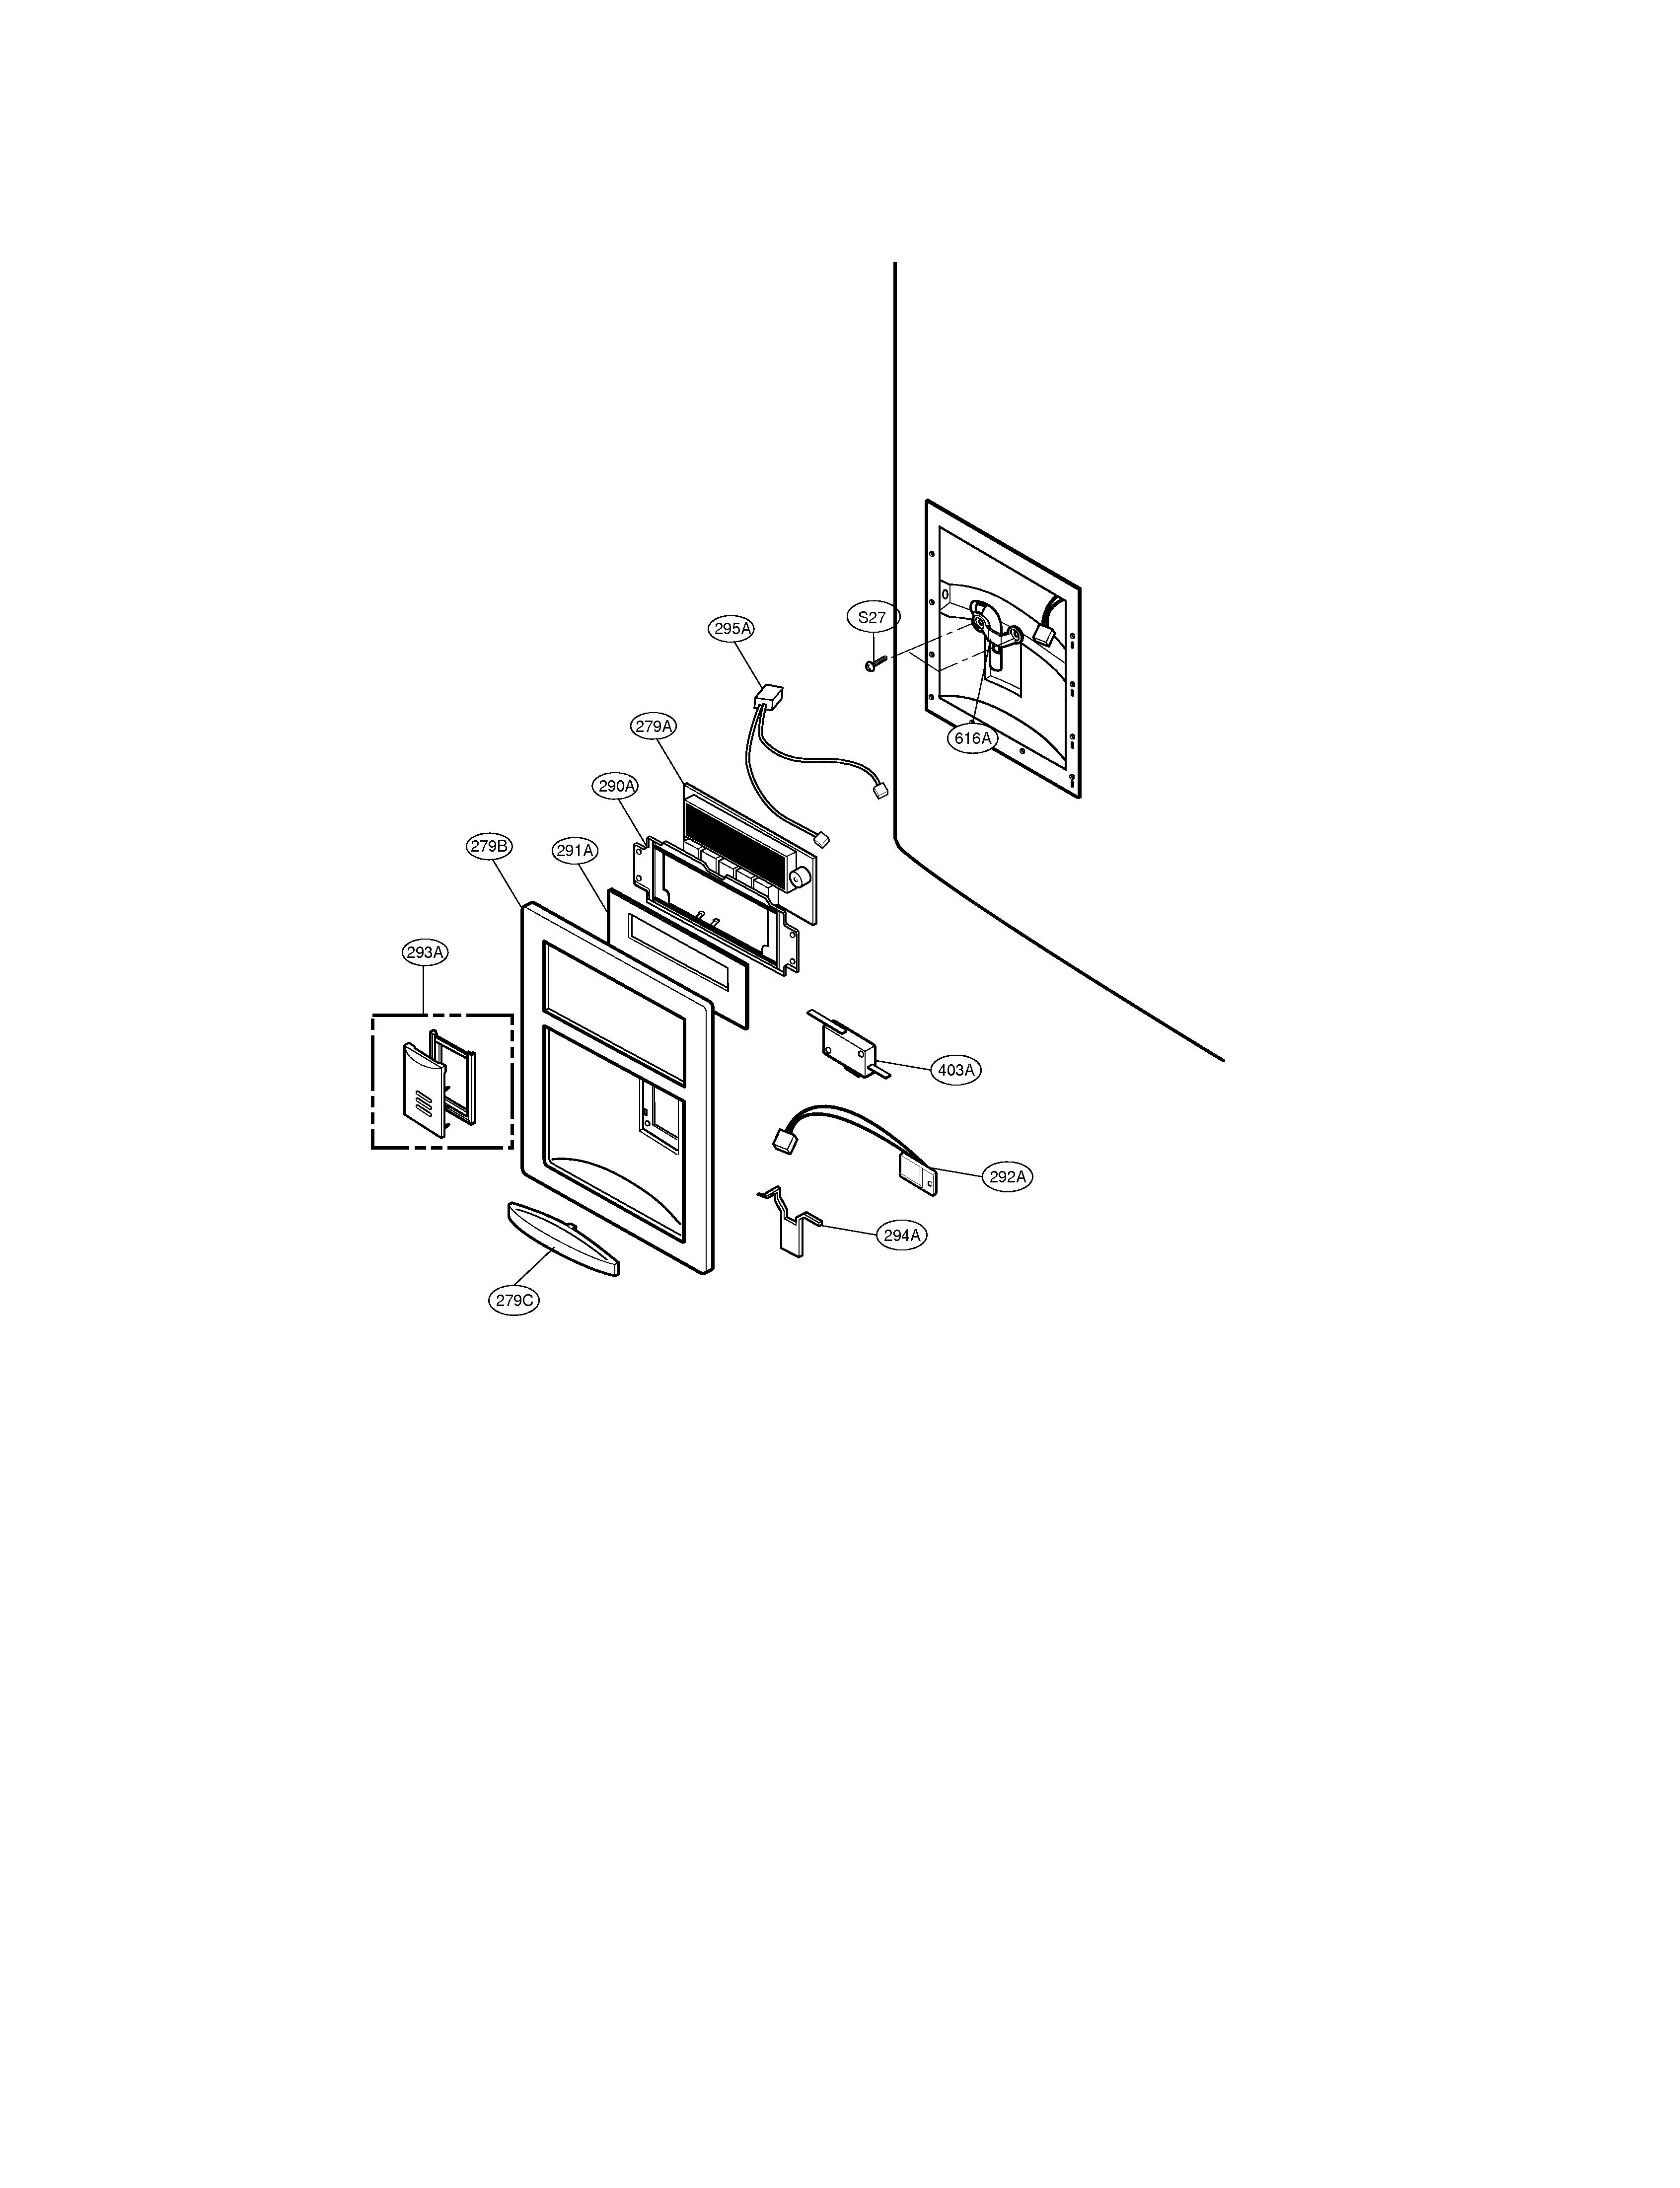 traulsen compressor wiring diagram bohn refrigeration